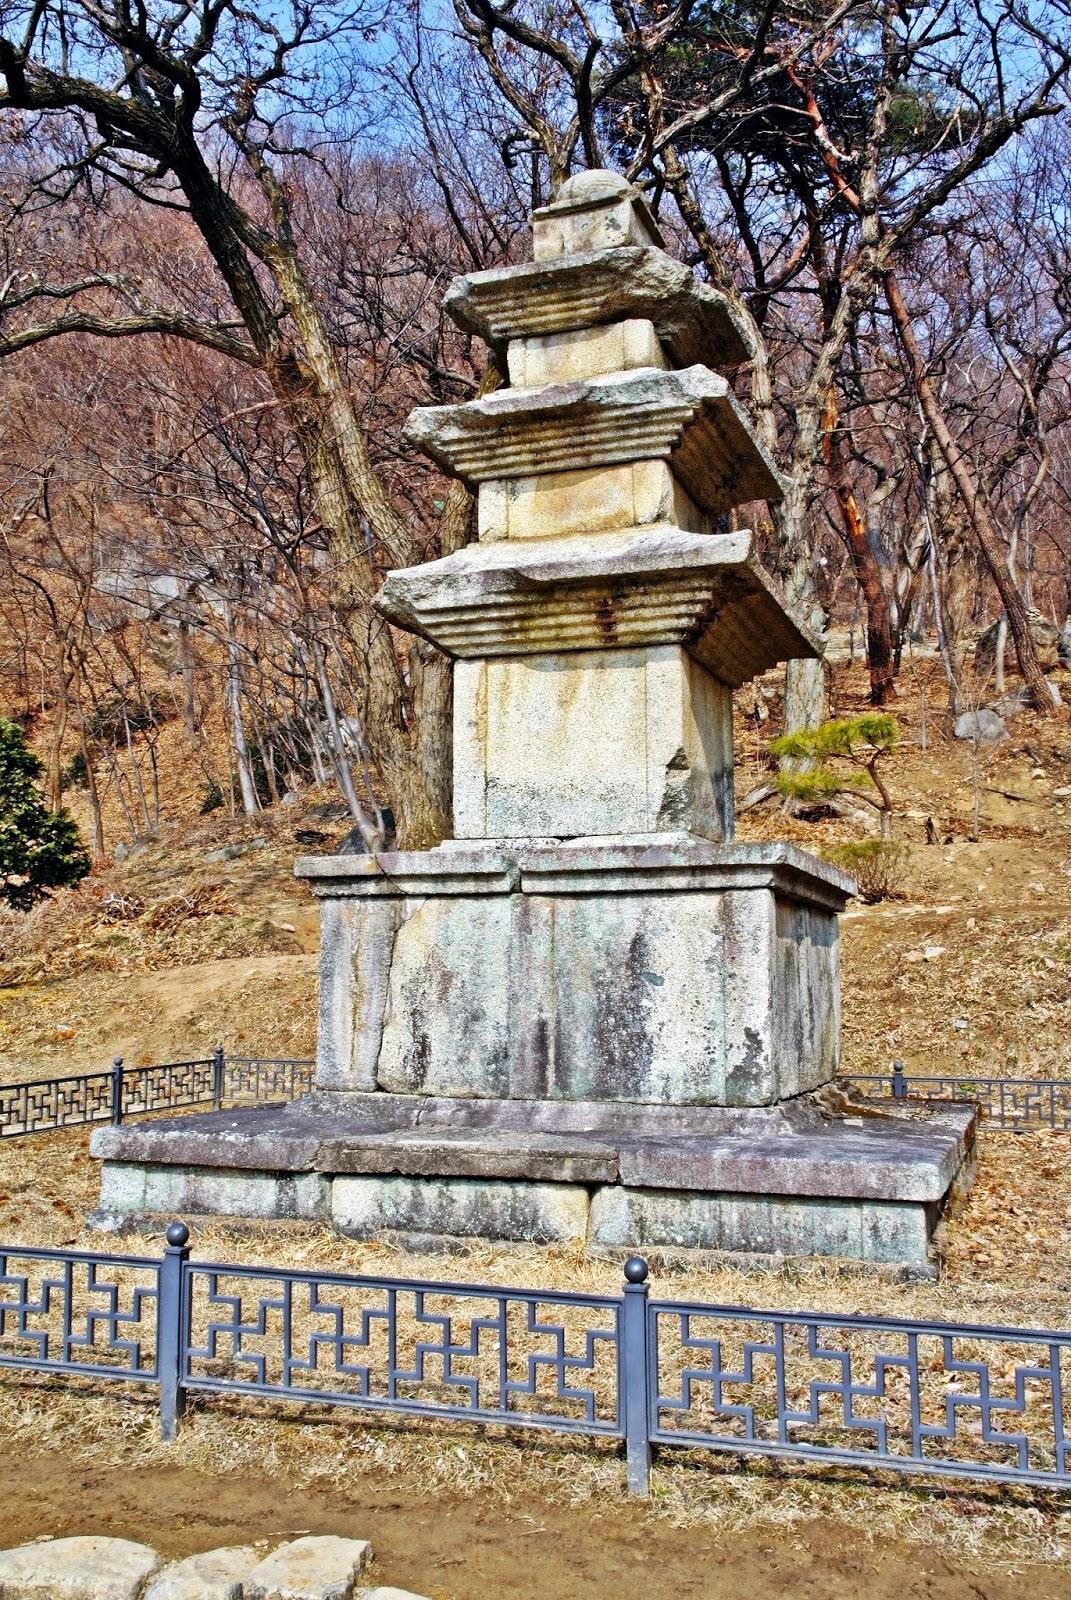 Treasures in Buseoksa Temple 부석사 | meheartseoul.blogspot.com